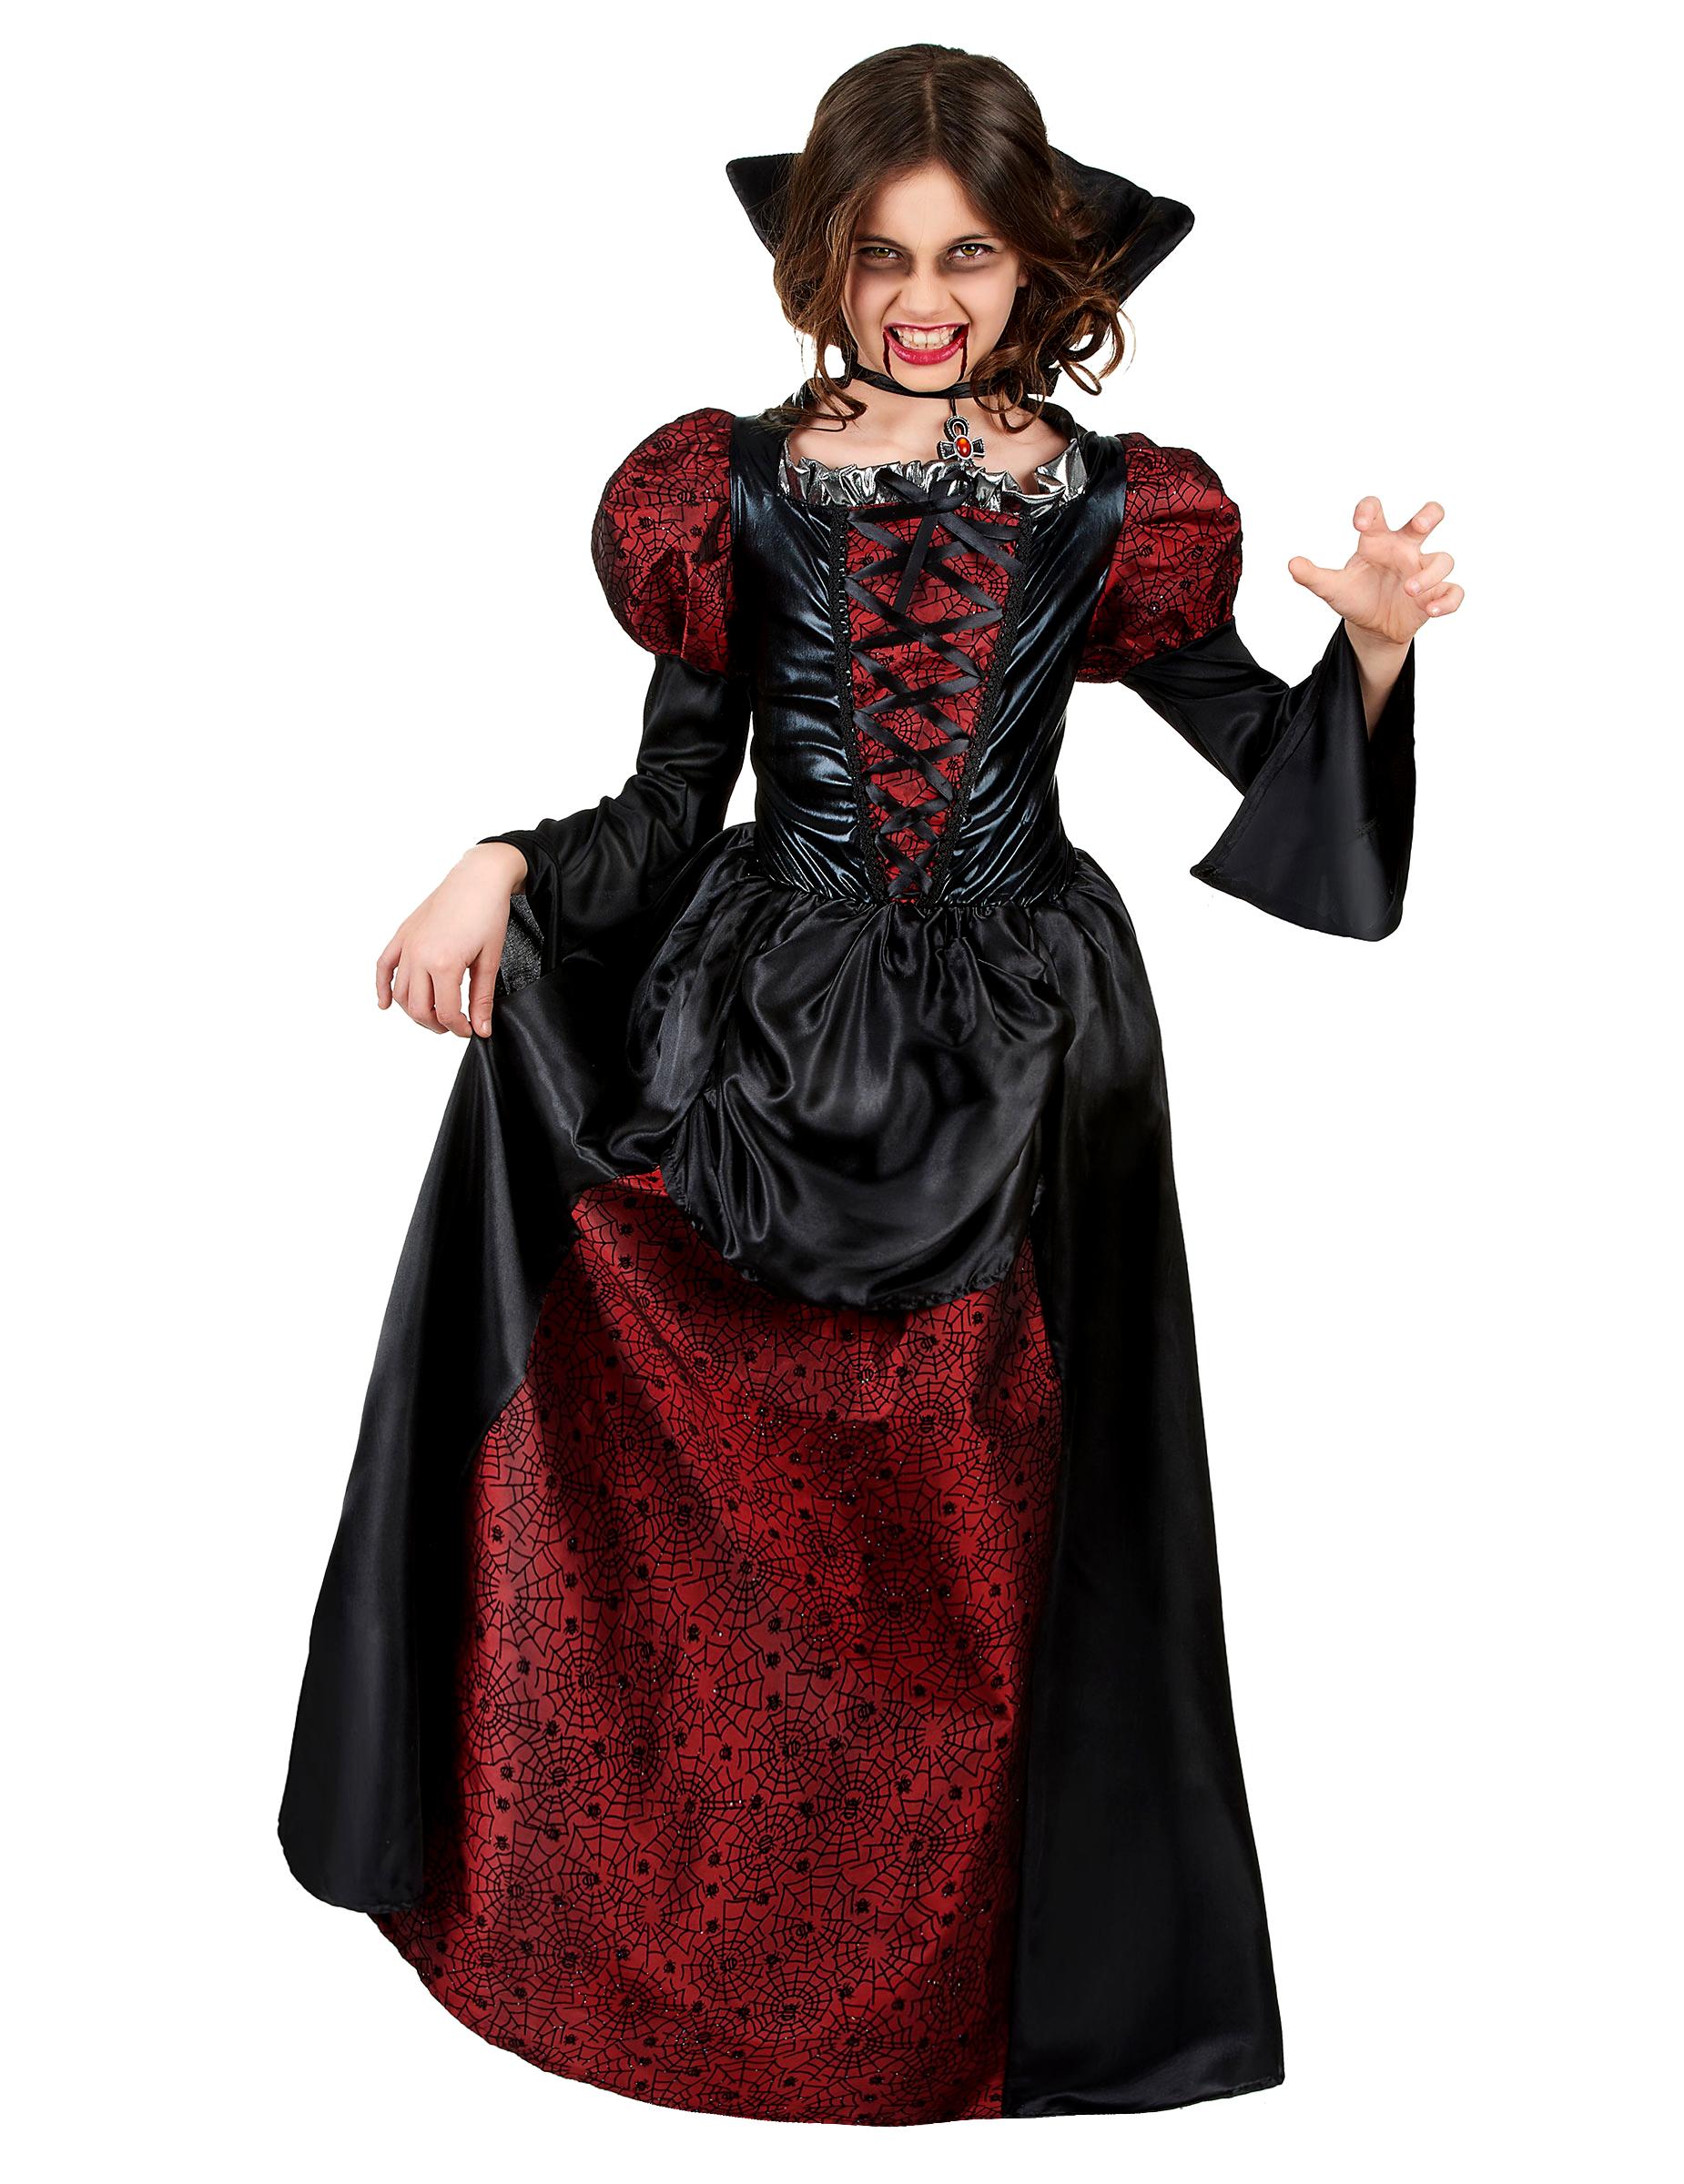 Halloween Kostüme Kinder Nähen.Halloween Kostüm Kinder Selber Nähen